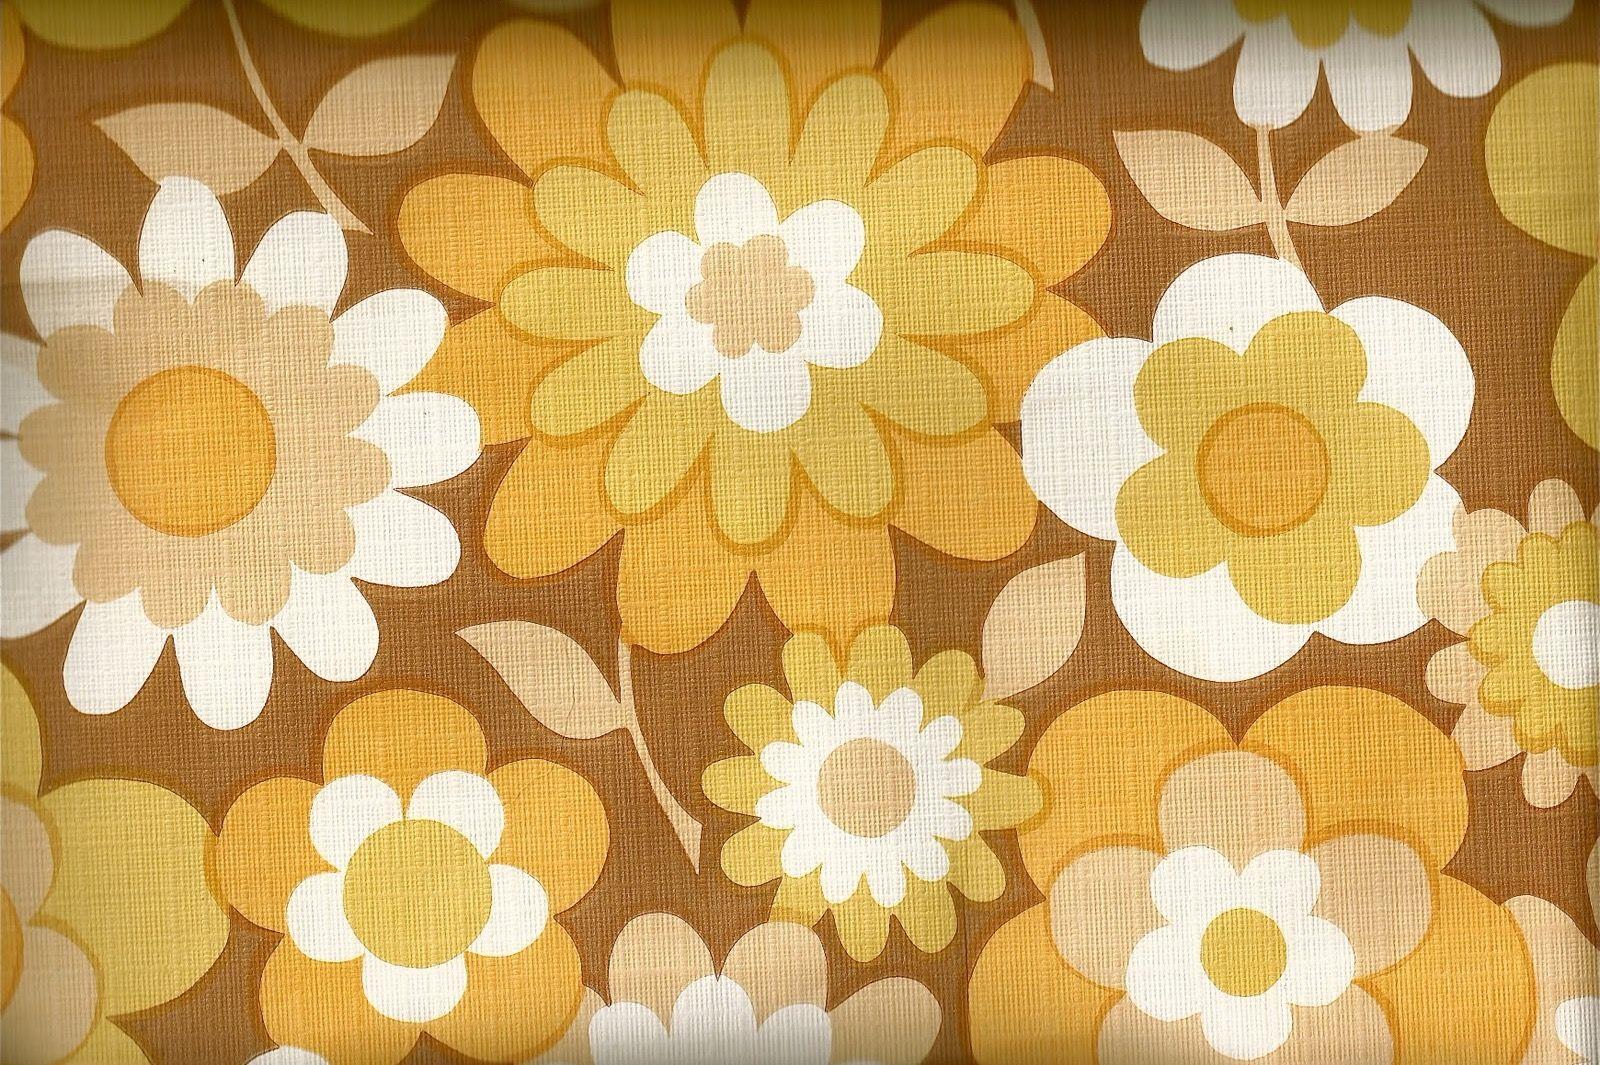 20's wallpaper   Wallpapers vintage, Painting patterns, Wallpaper